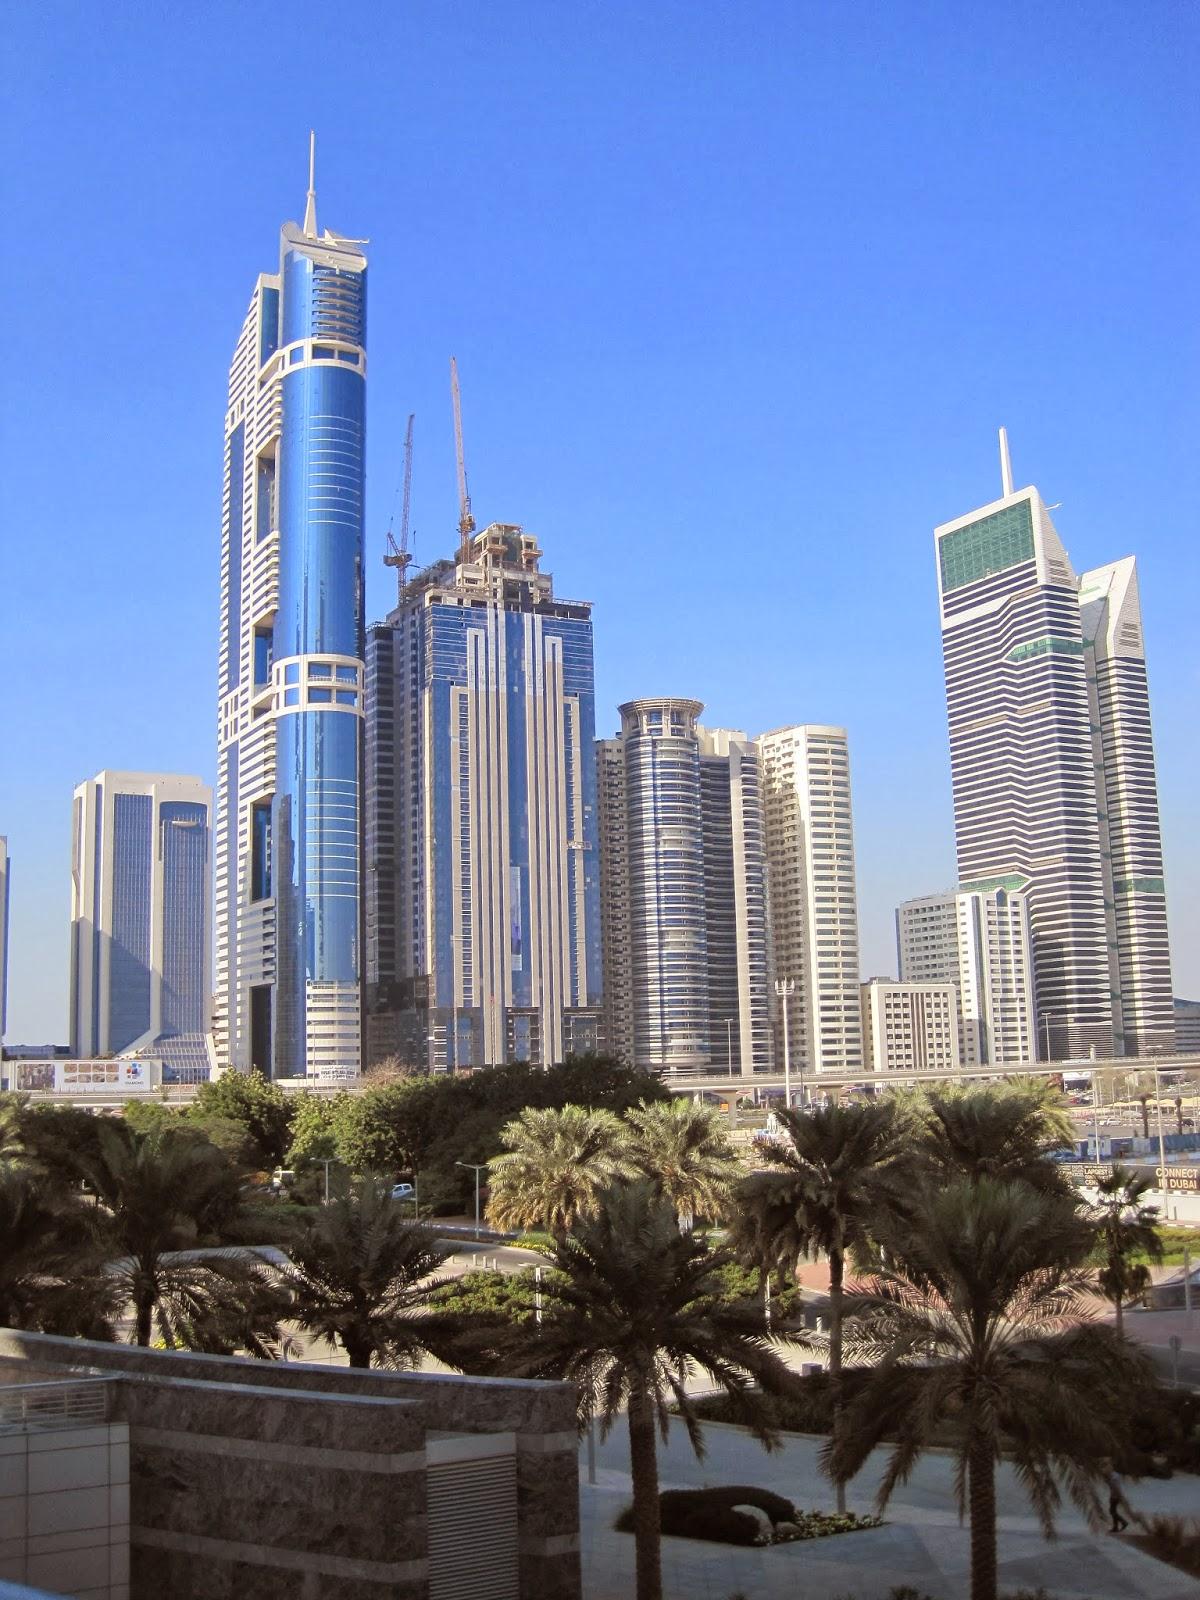 abu dhabi al ain dubai emirates towers. Black Bedroom Furniture Sets. Home Design Ideas